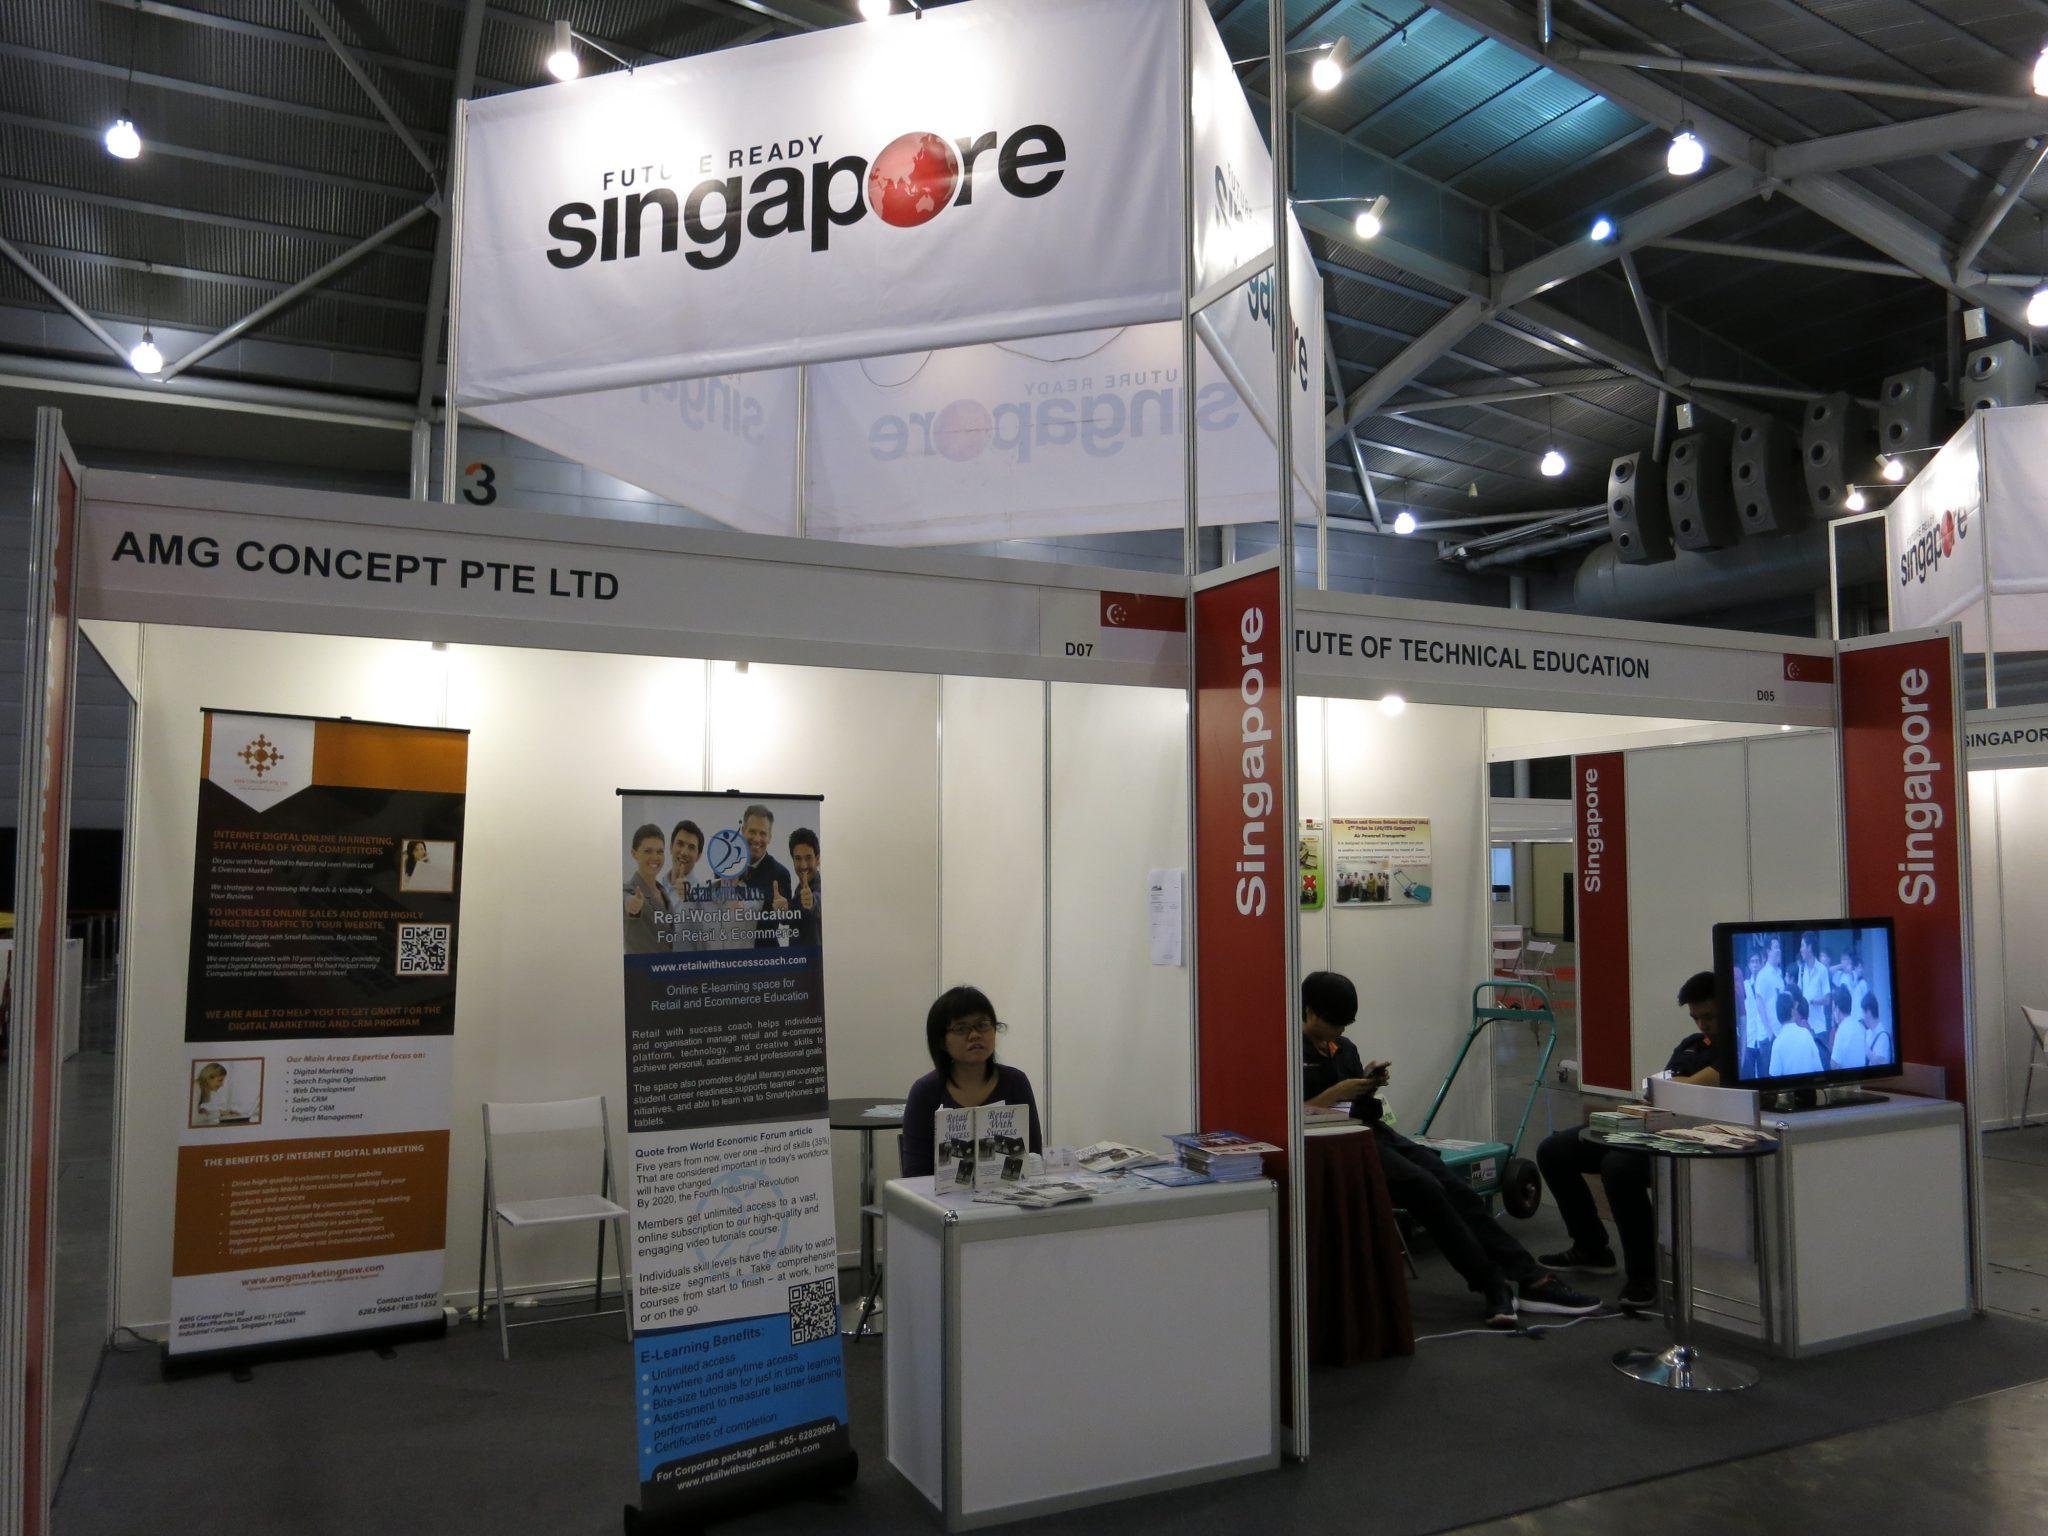 AMG Concept exhibition